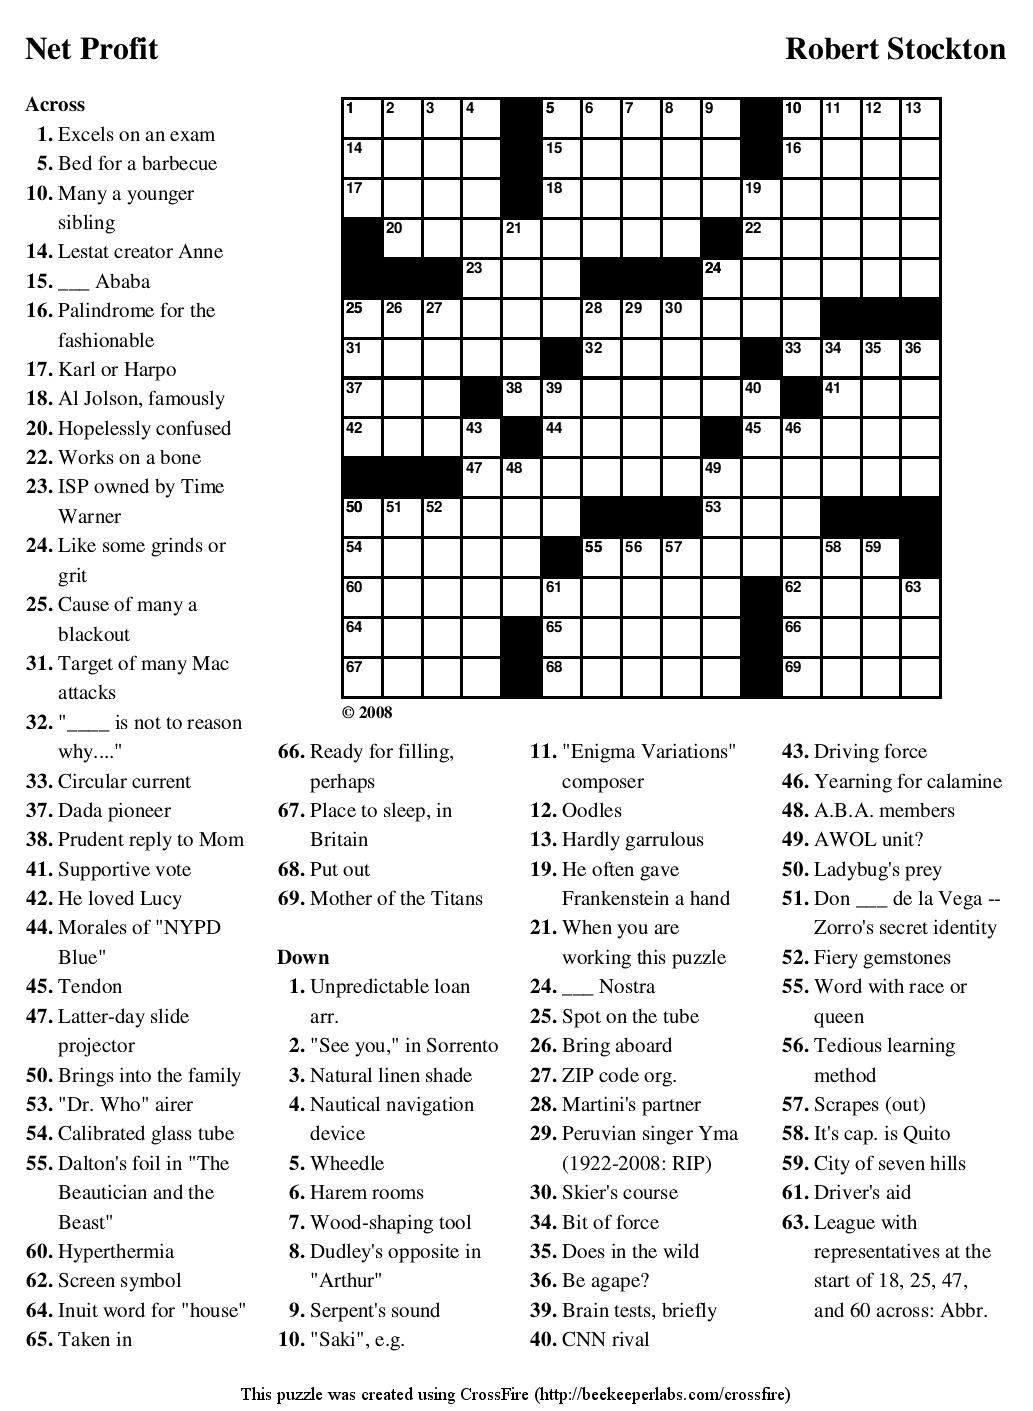 Netprofit Large Crosswords Printable Crossword Puzzle - Printable Crossword Puzzles Pdf